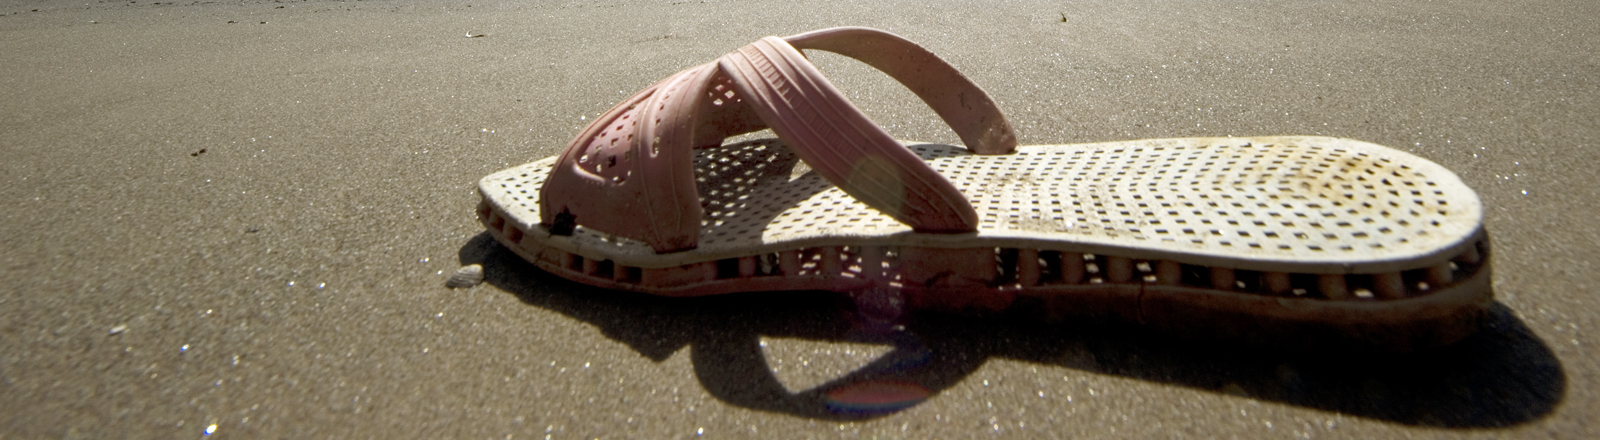 Eine verlorene Sandale.